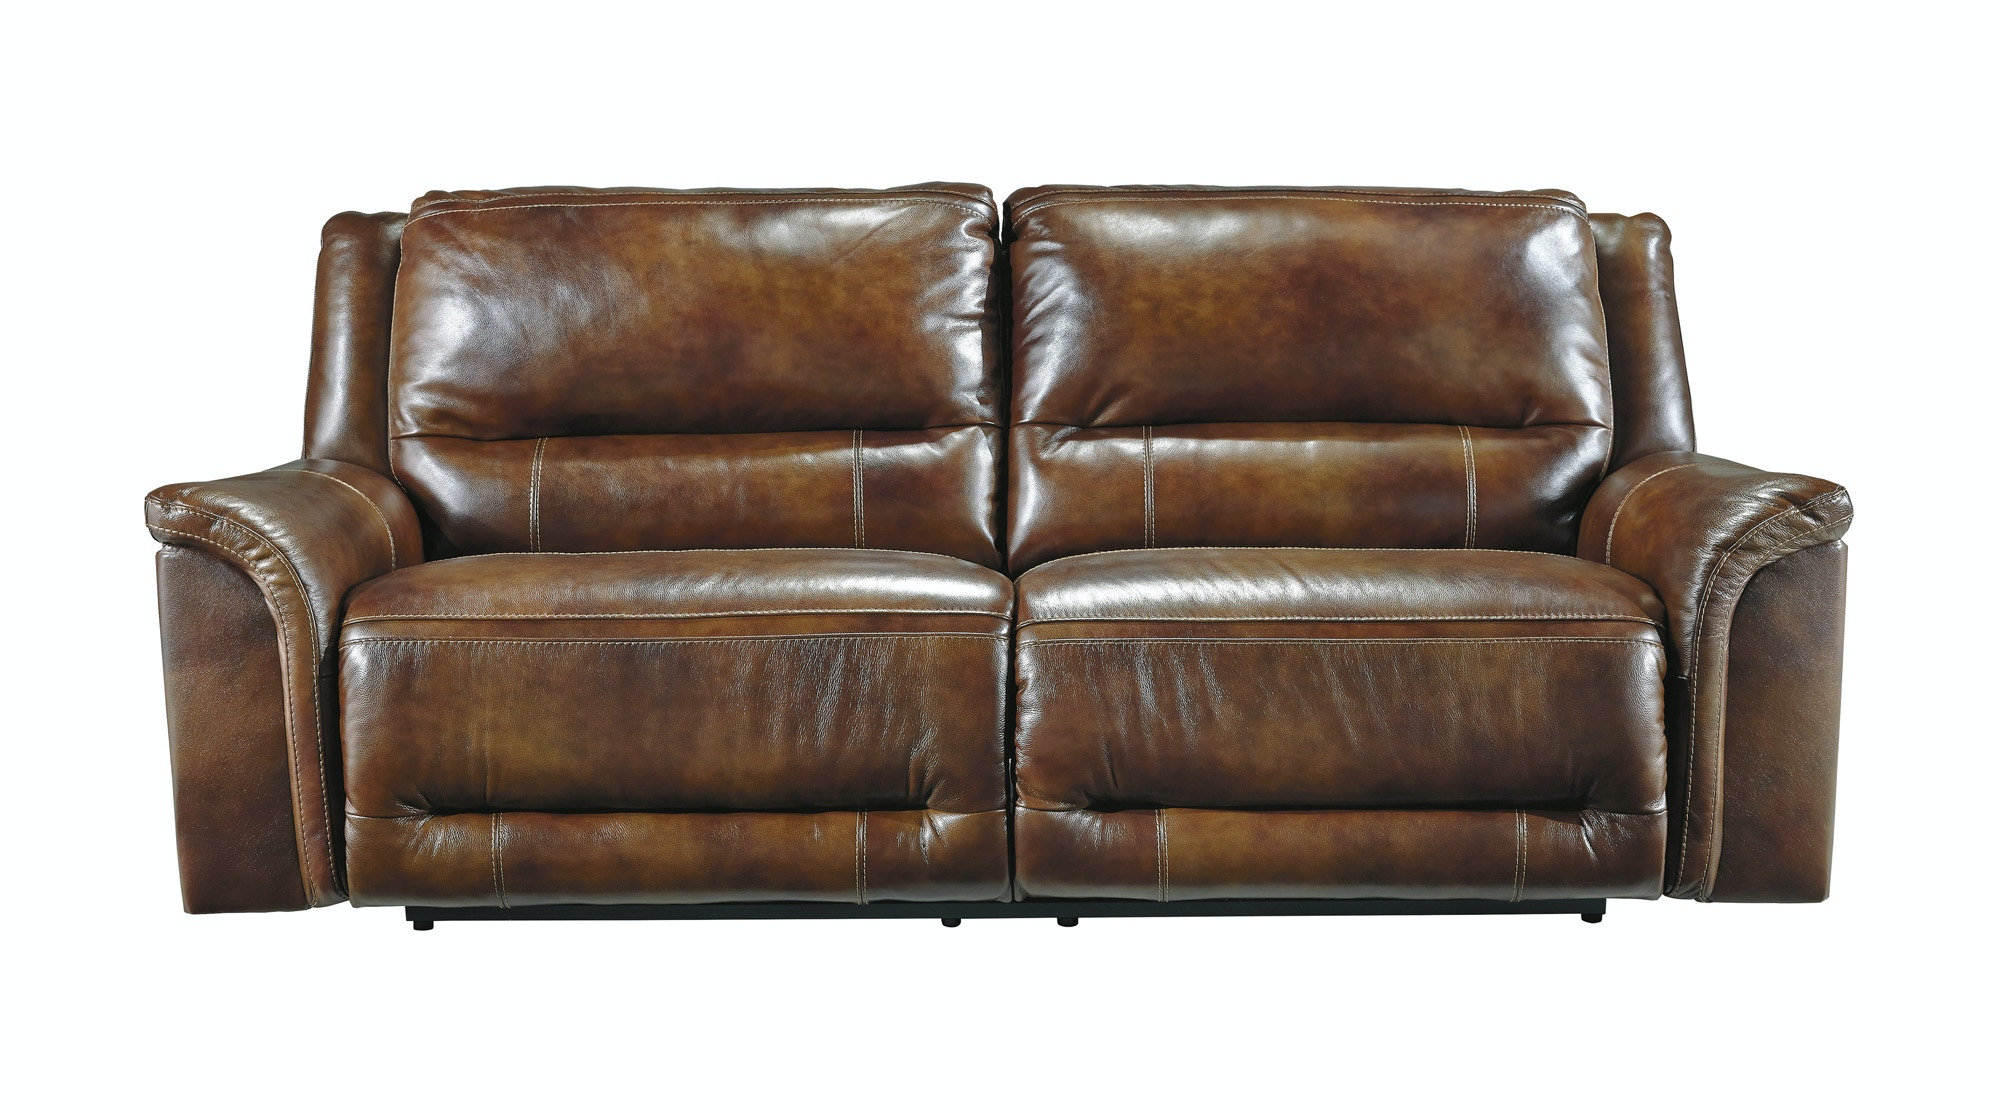 Signature Design by Ashley Living Room Jayron Power Reclining Sofa 051045 - Furniture Fair ...